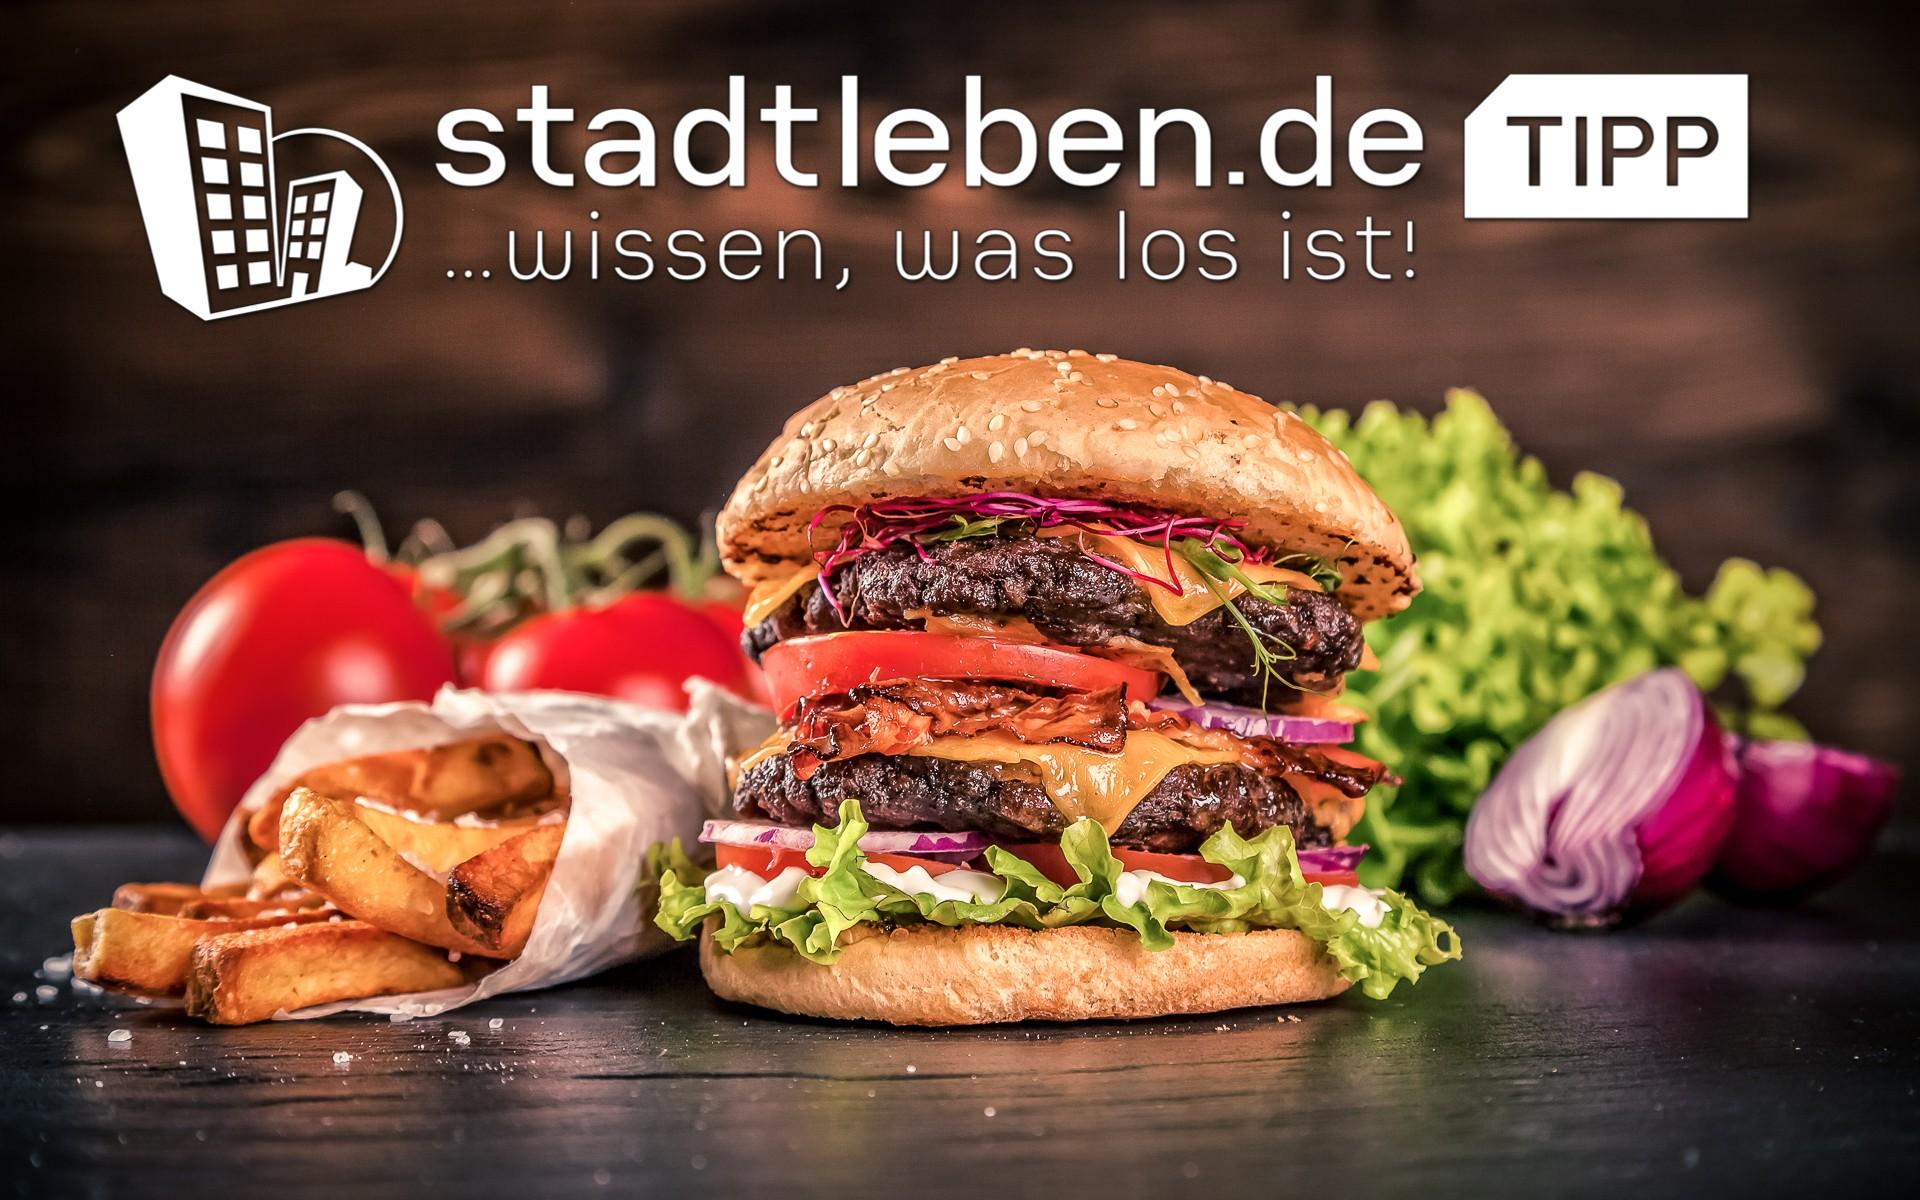 Burger, Pommes, Gemüse, Zwiebel, Tomate, Eisbergsalat